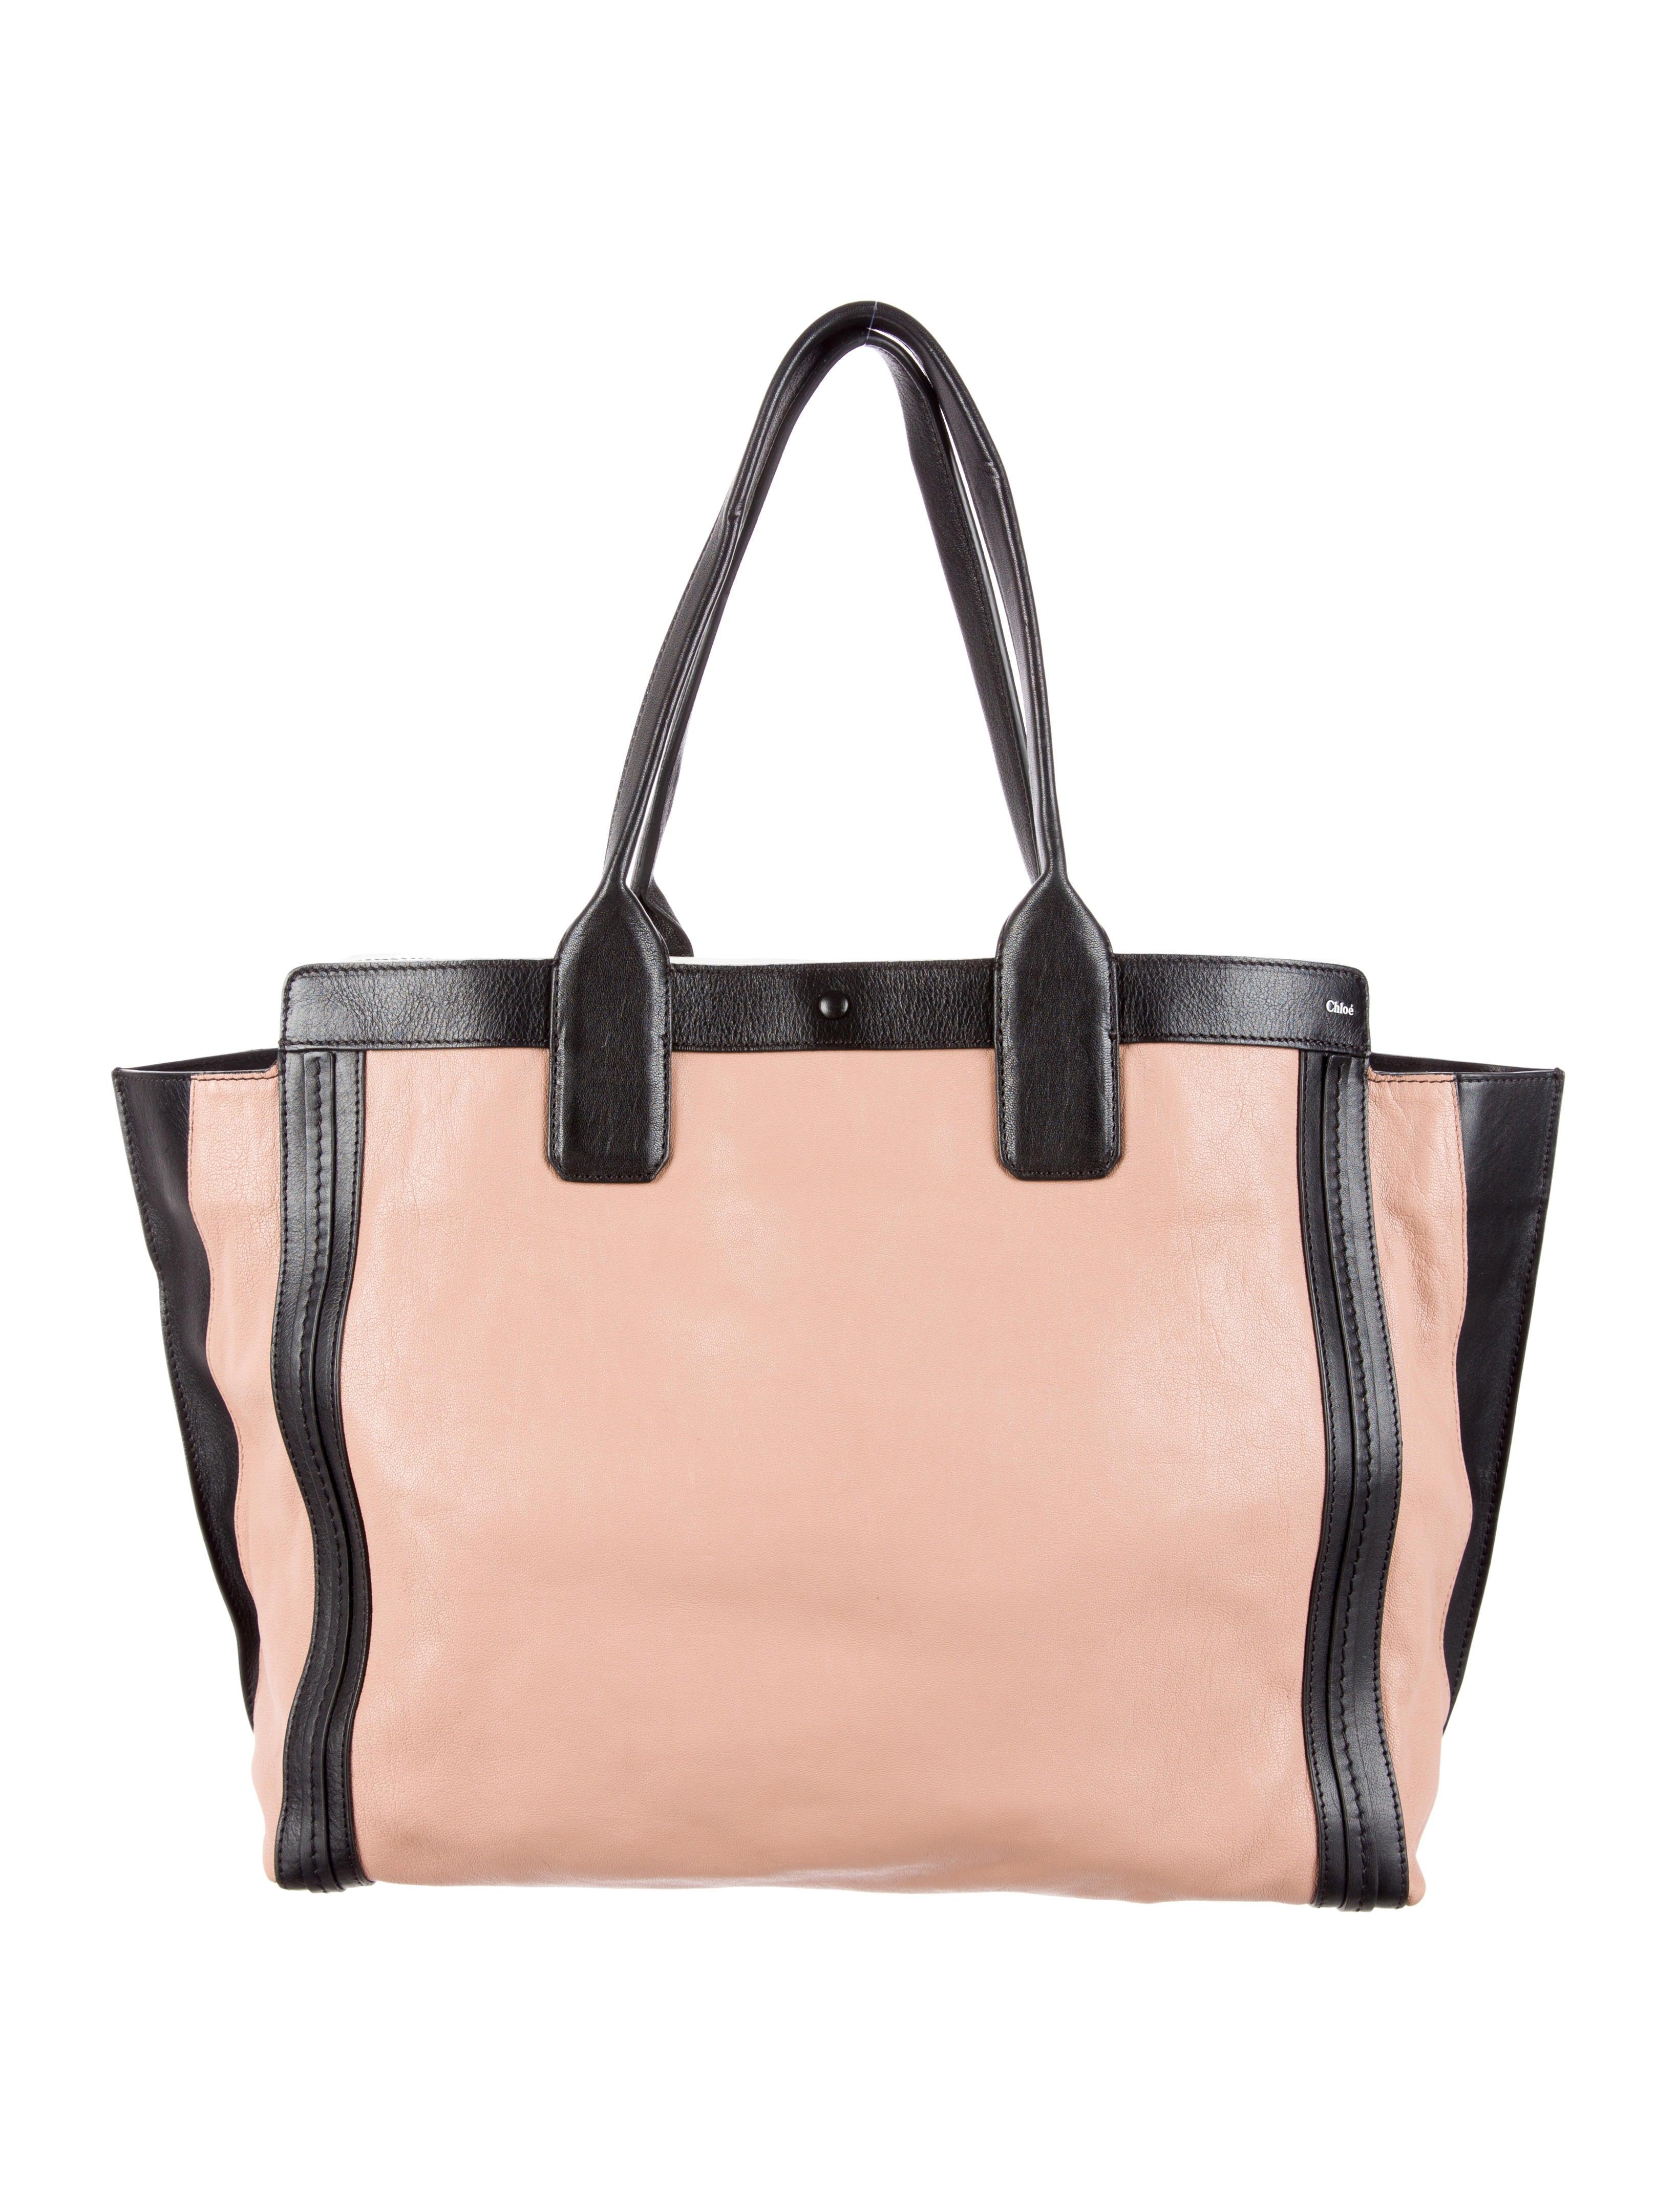 how to spot a fake chloe marcie bag - chloe laser cut alison bag, buy chloe online